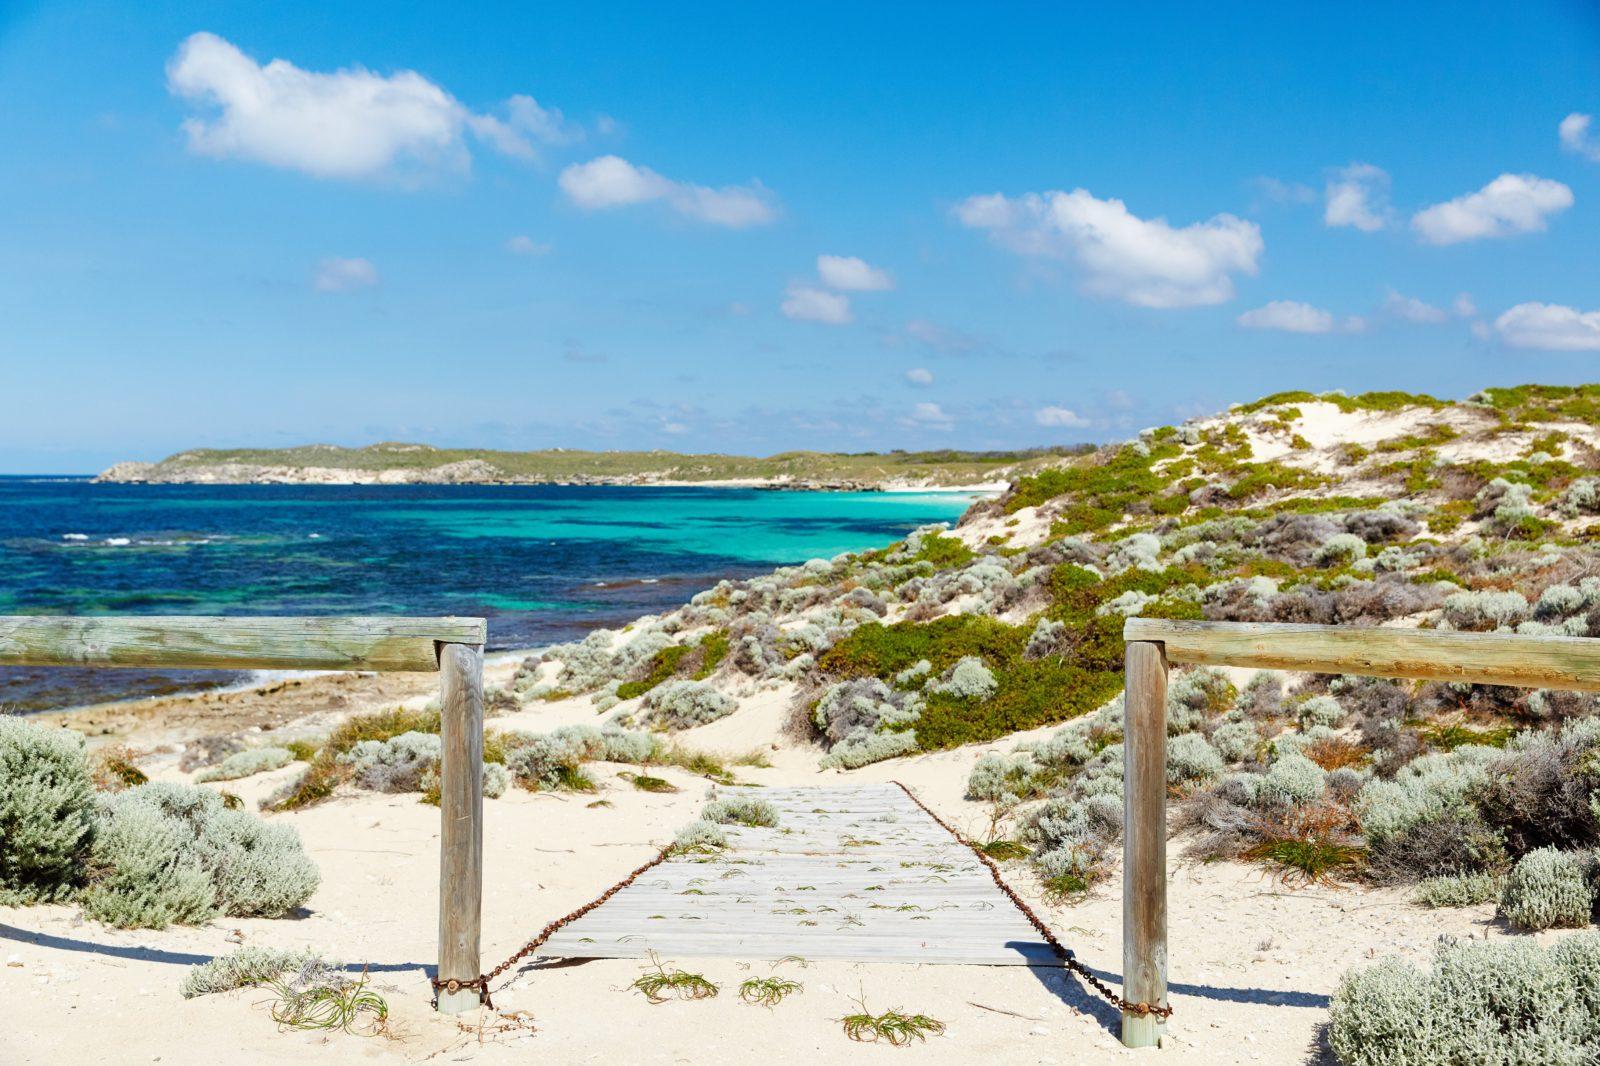 Strickland Bay, Rottnest Island, Western Australia